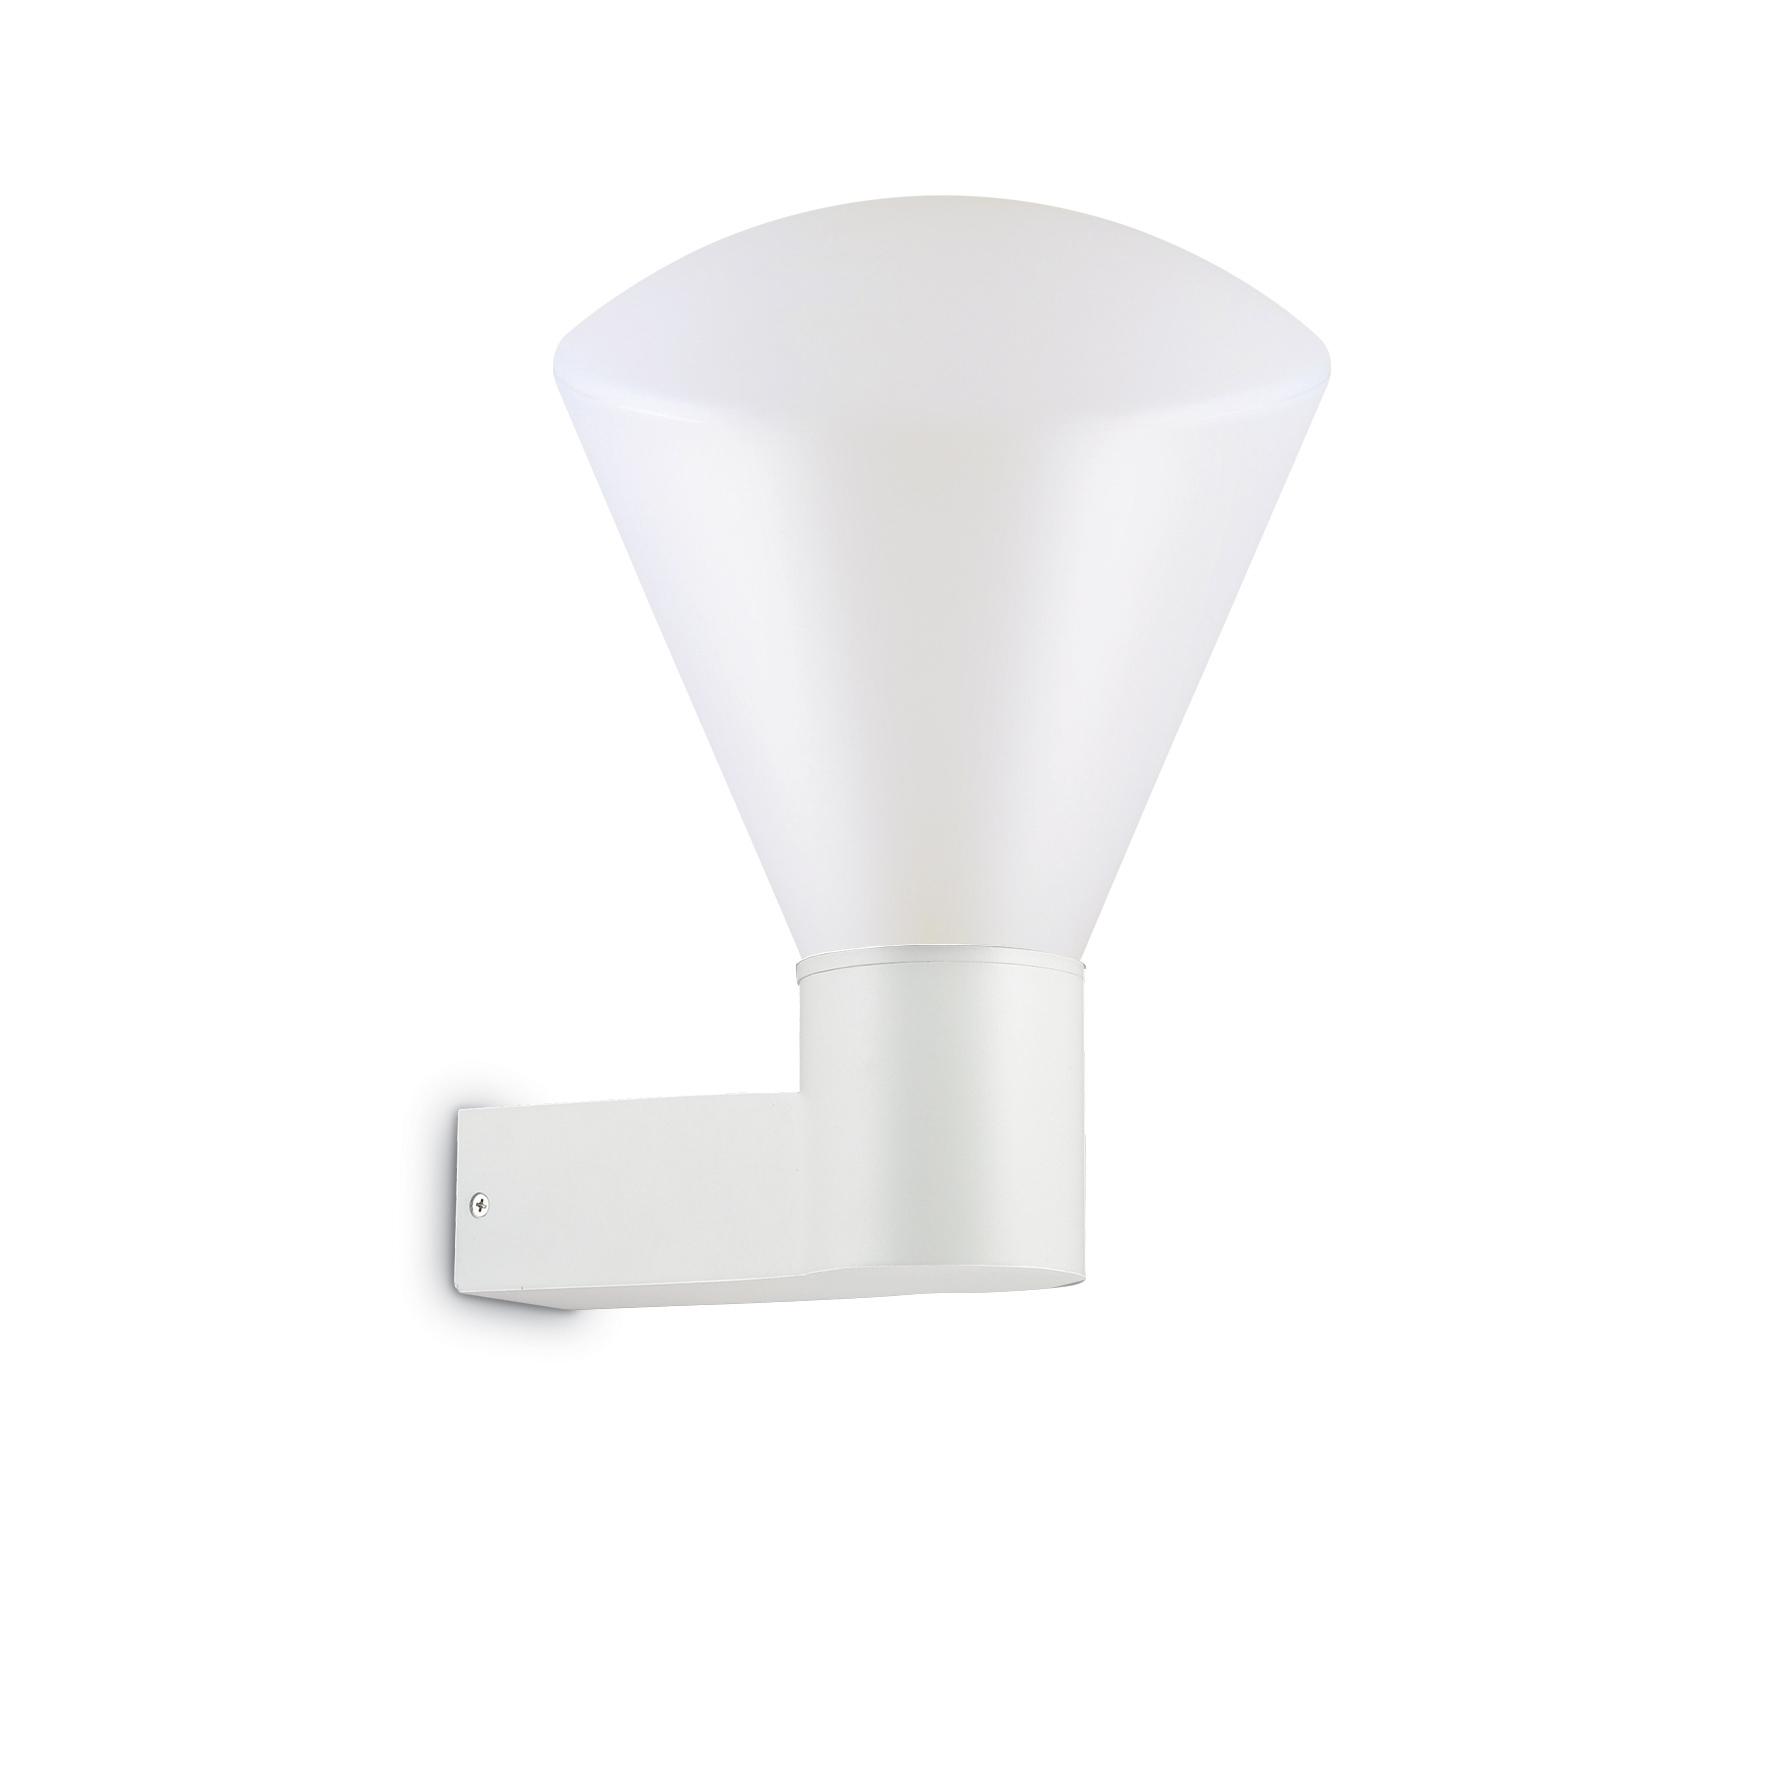 Aplica Ouverture AP1 White